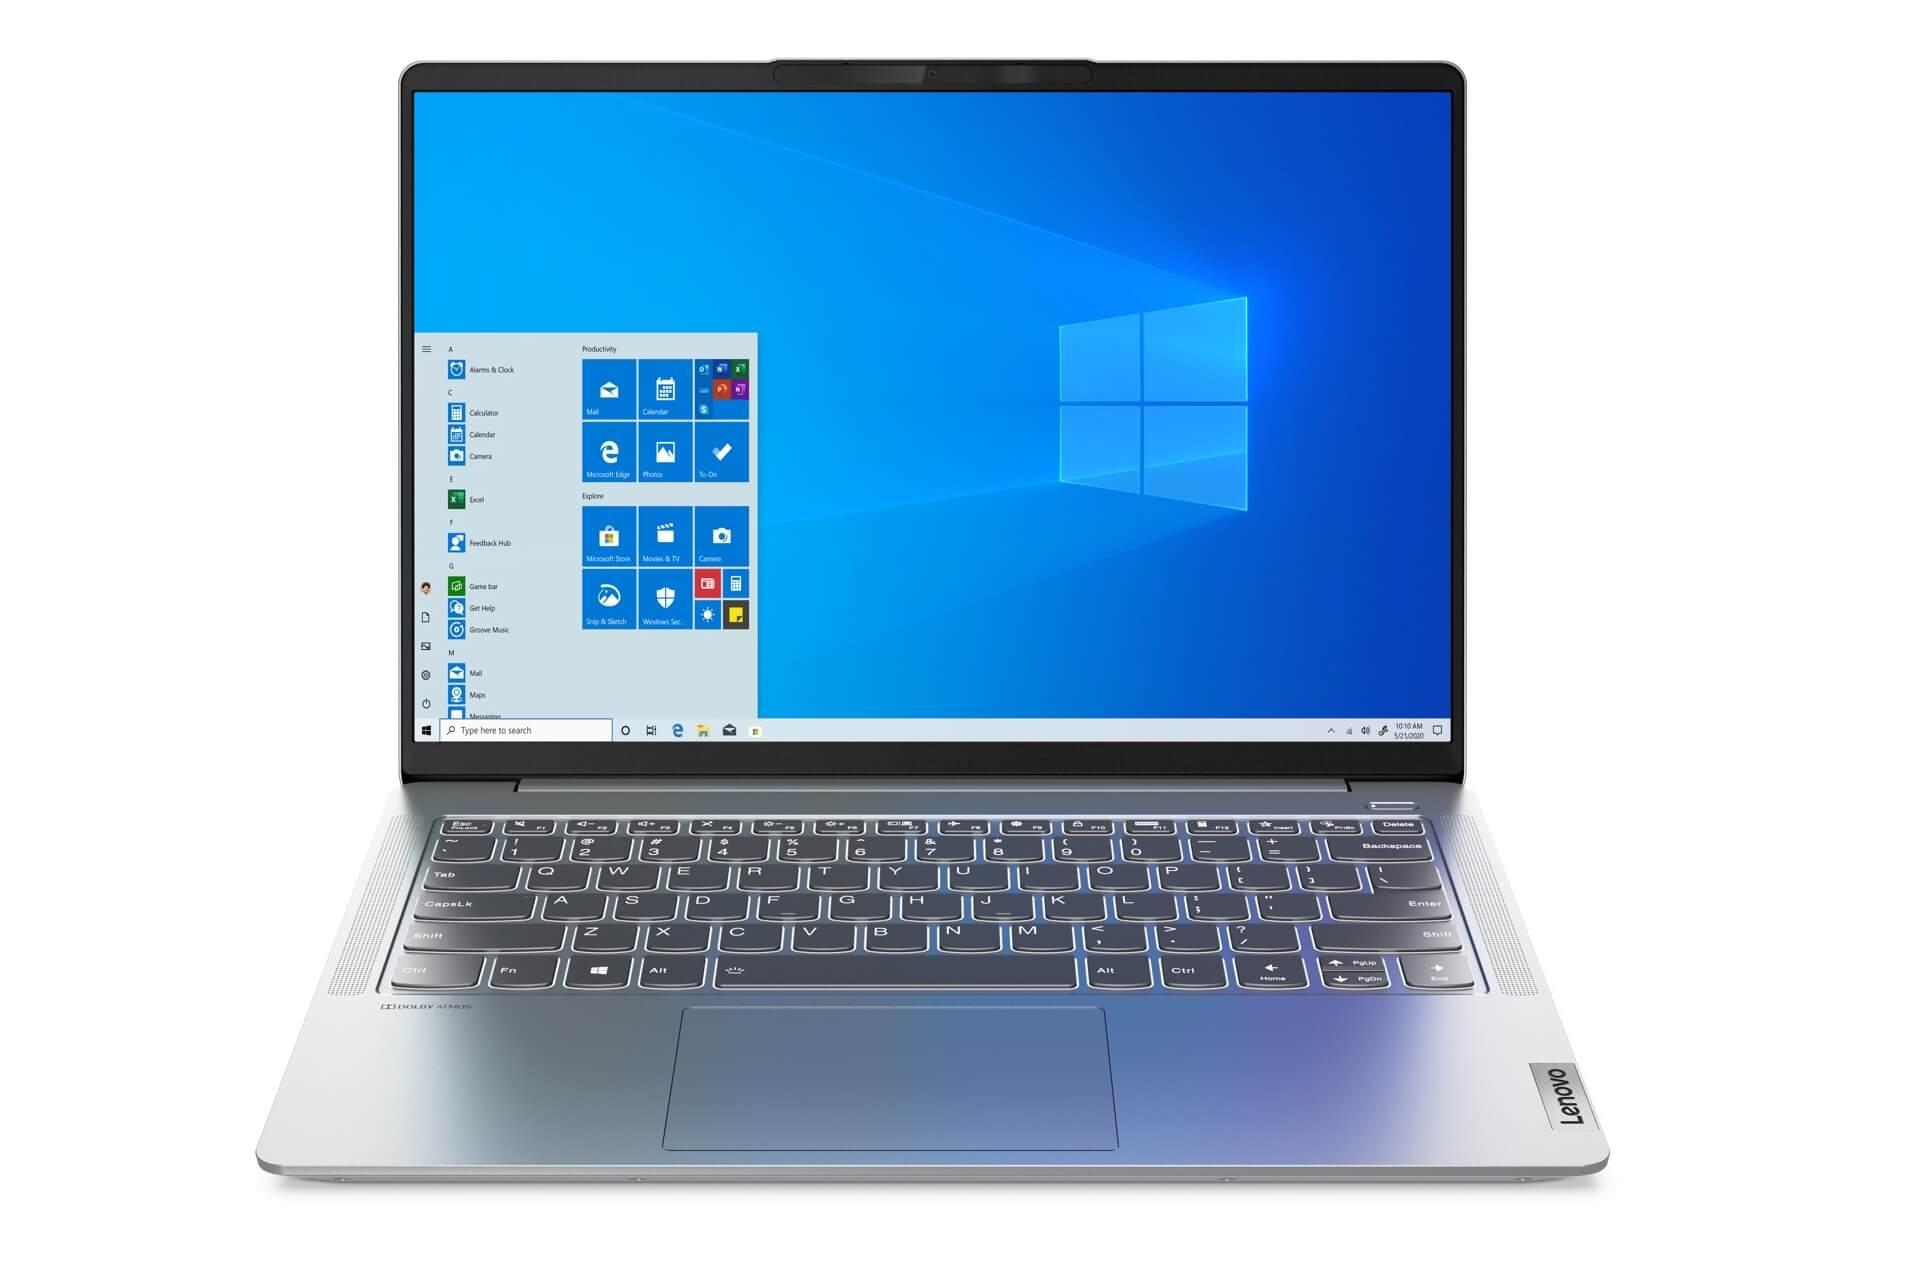 Lenovo представила 5G-ноутбук IdeaPad 5G с процессором Snapdragon